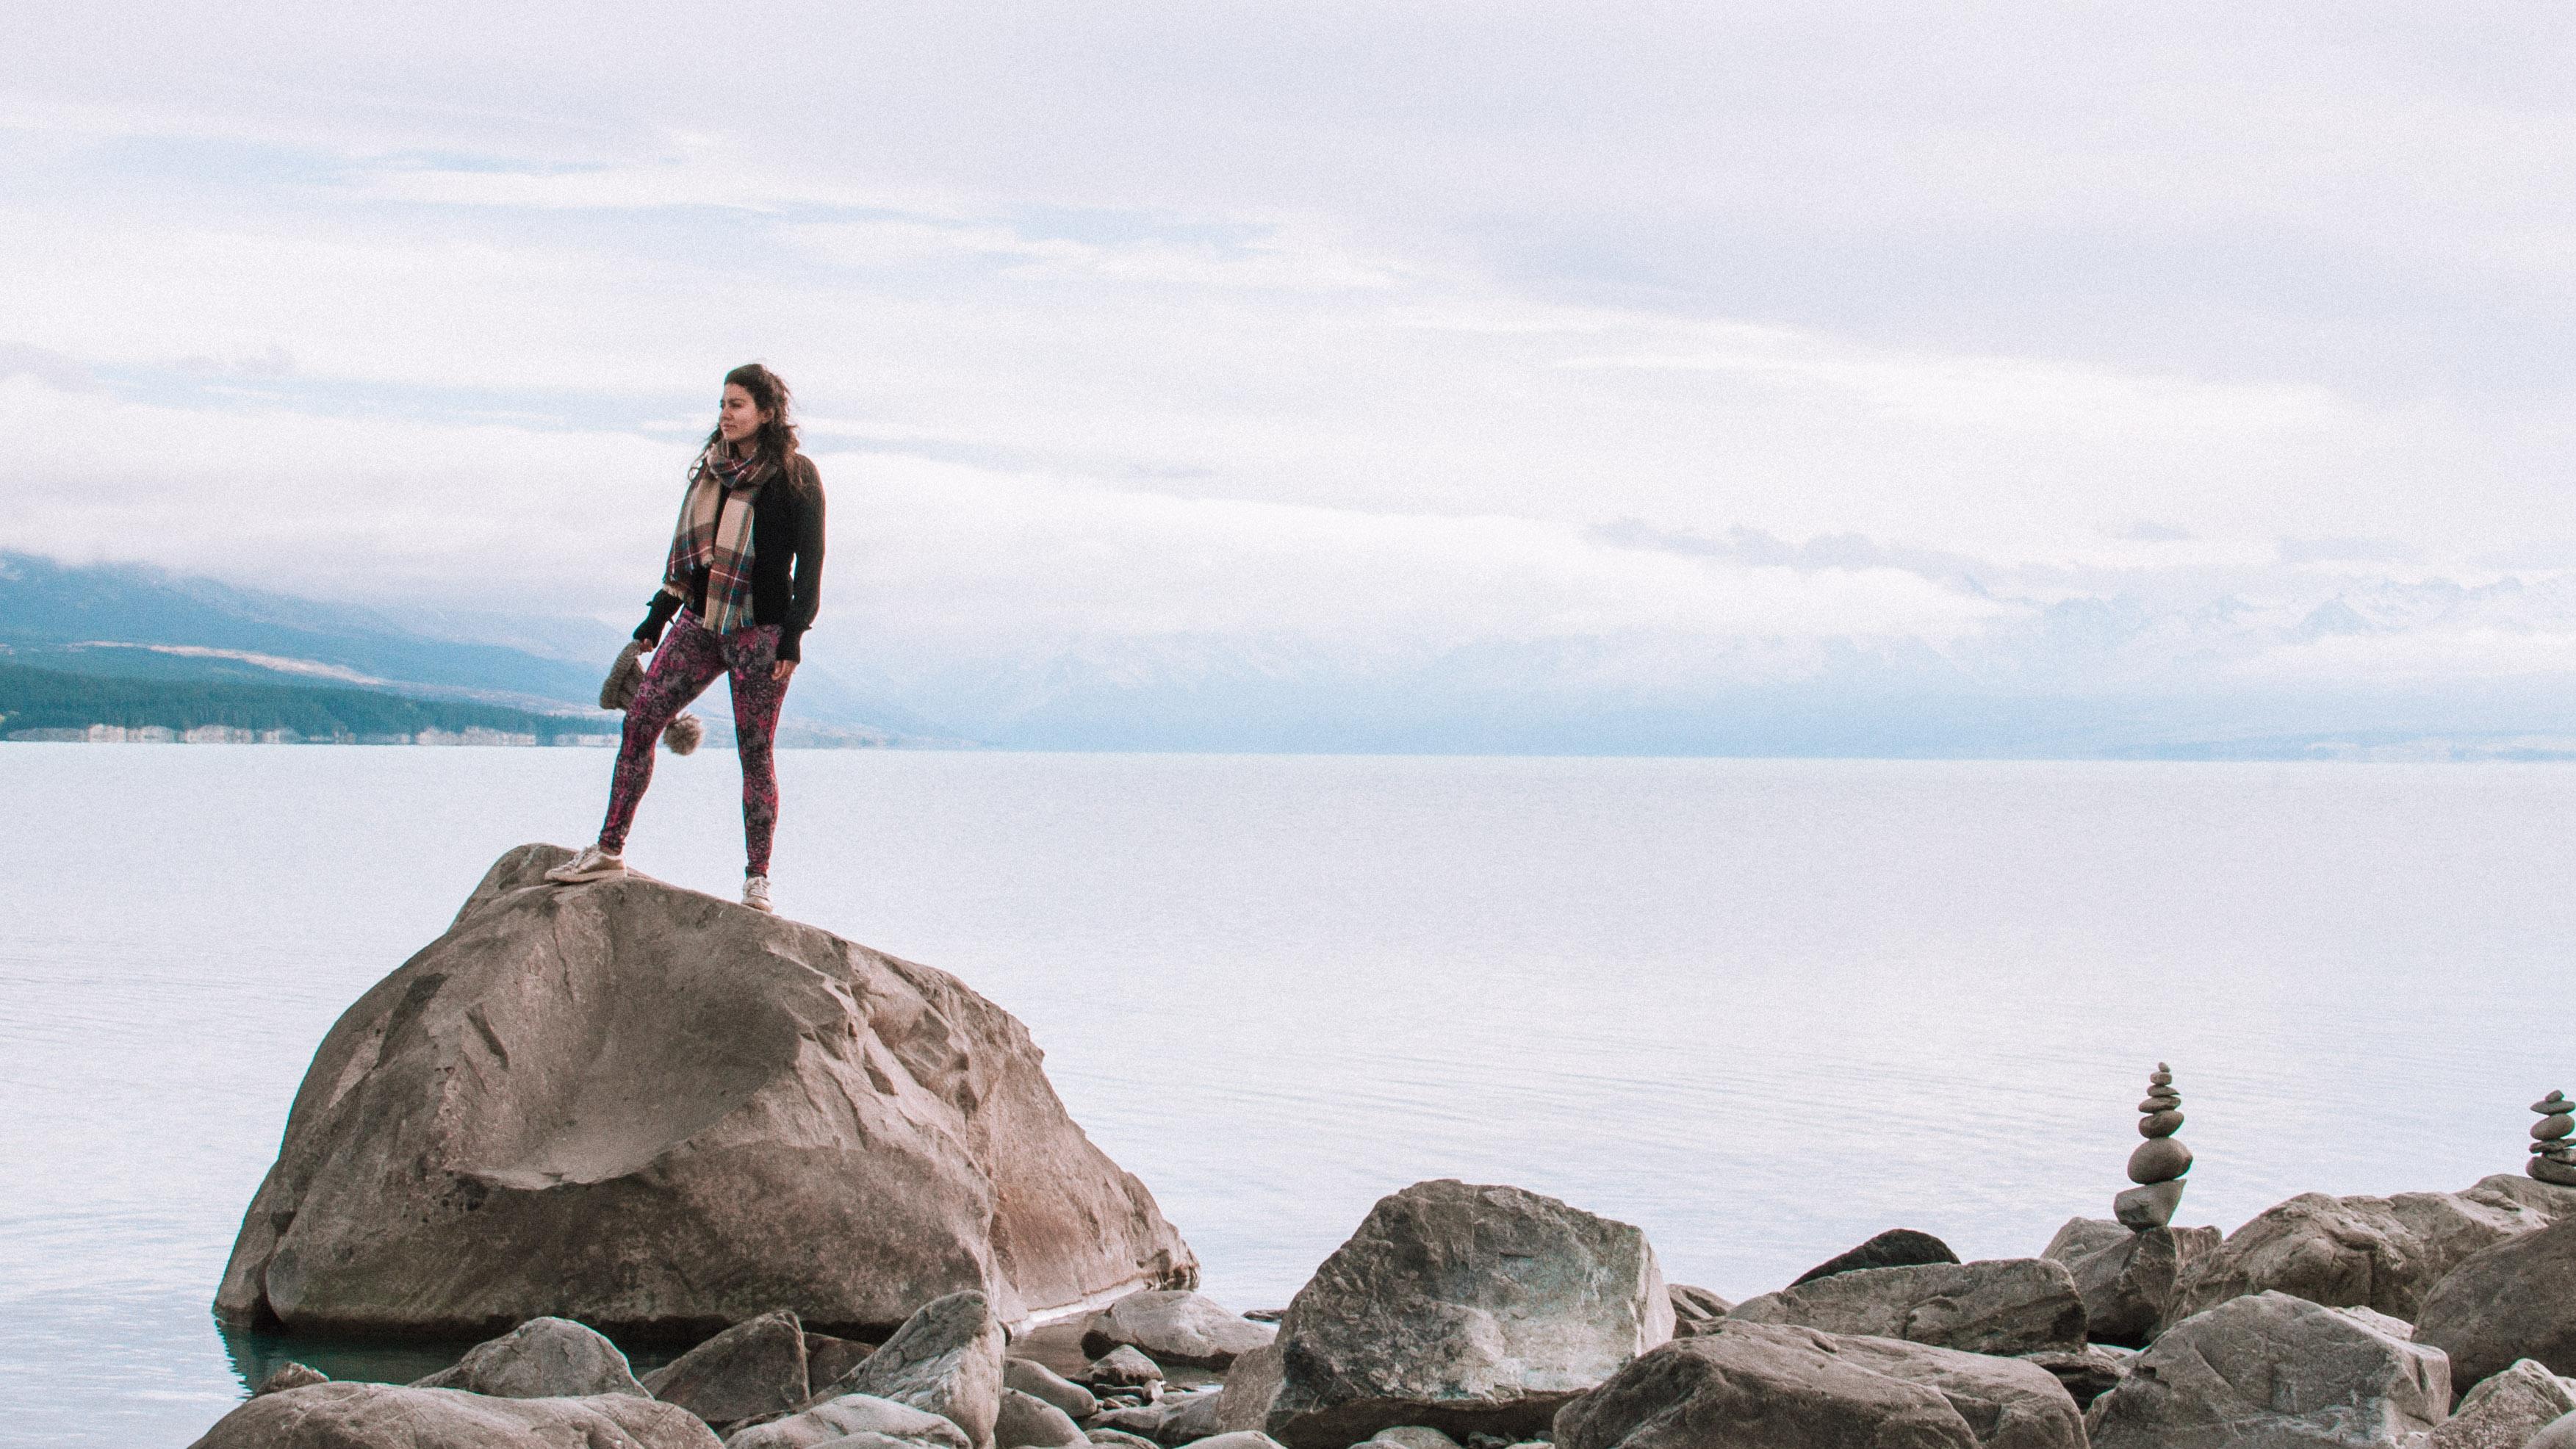 Tony Robbins UPW: How It Changed My Limiting Beliefs & Life